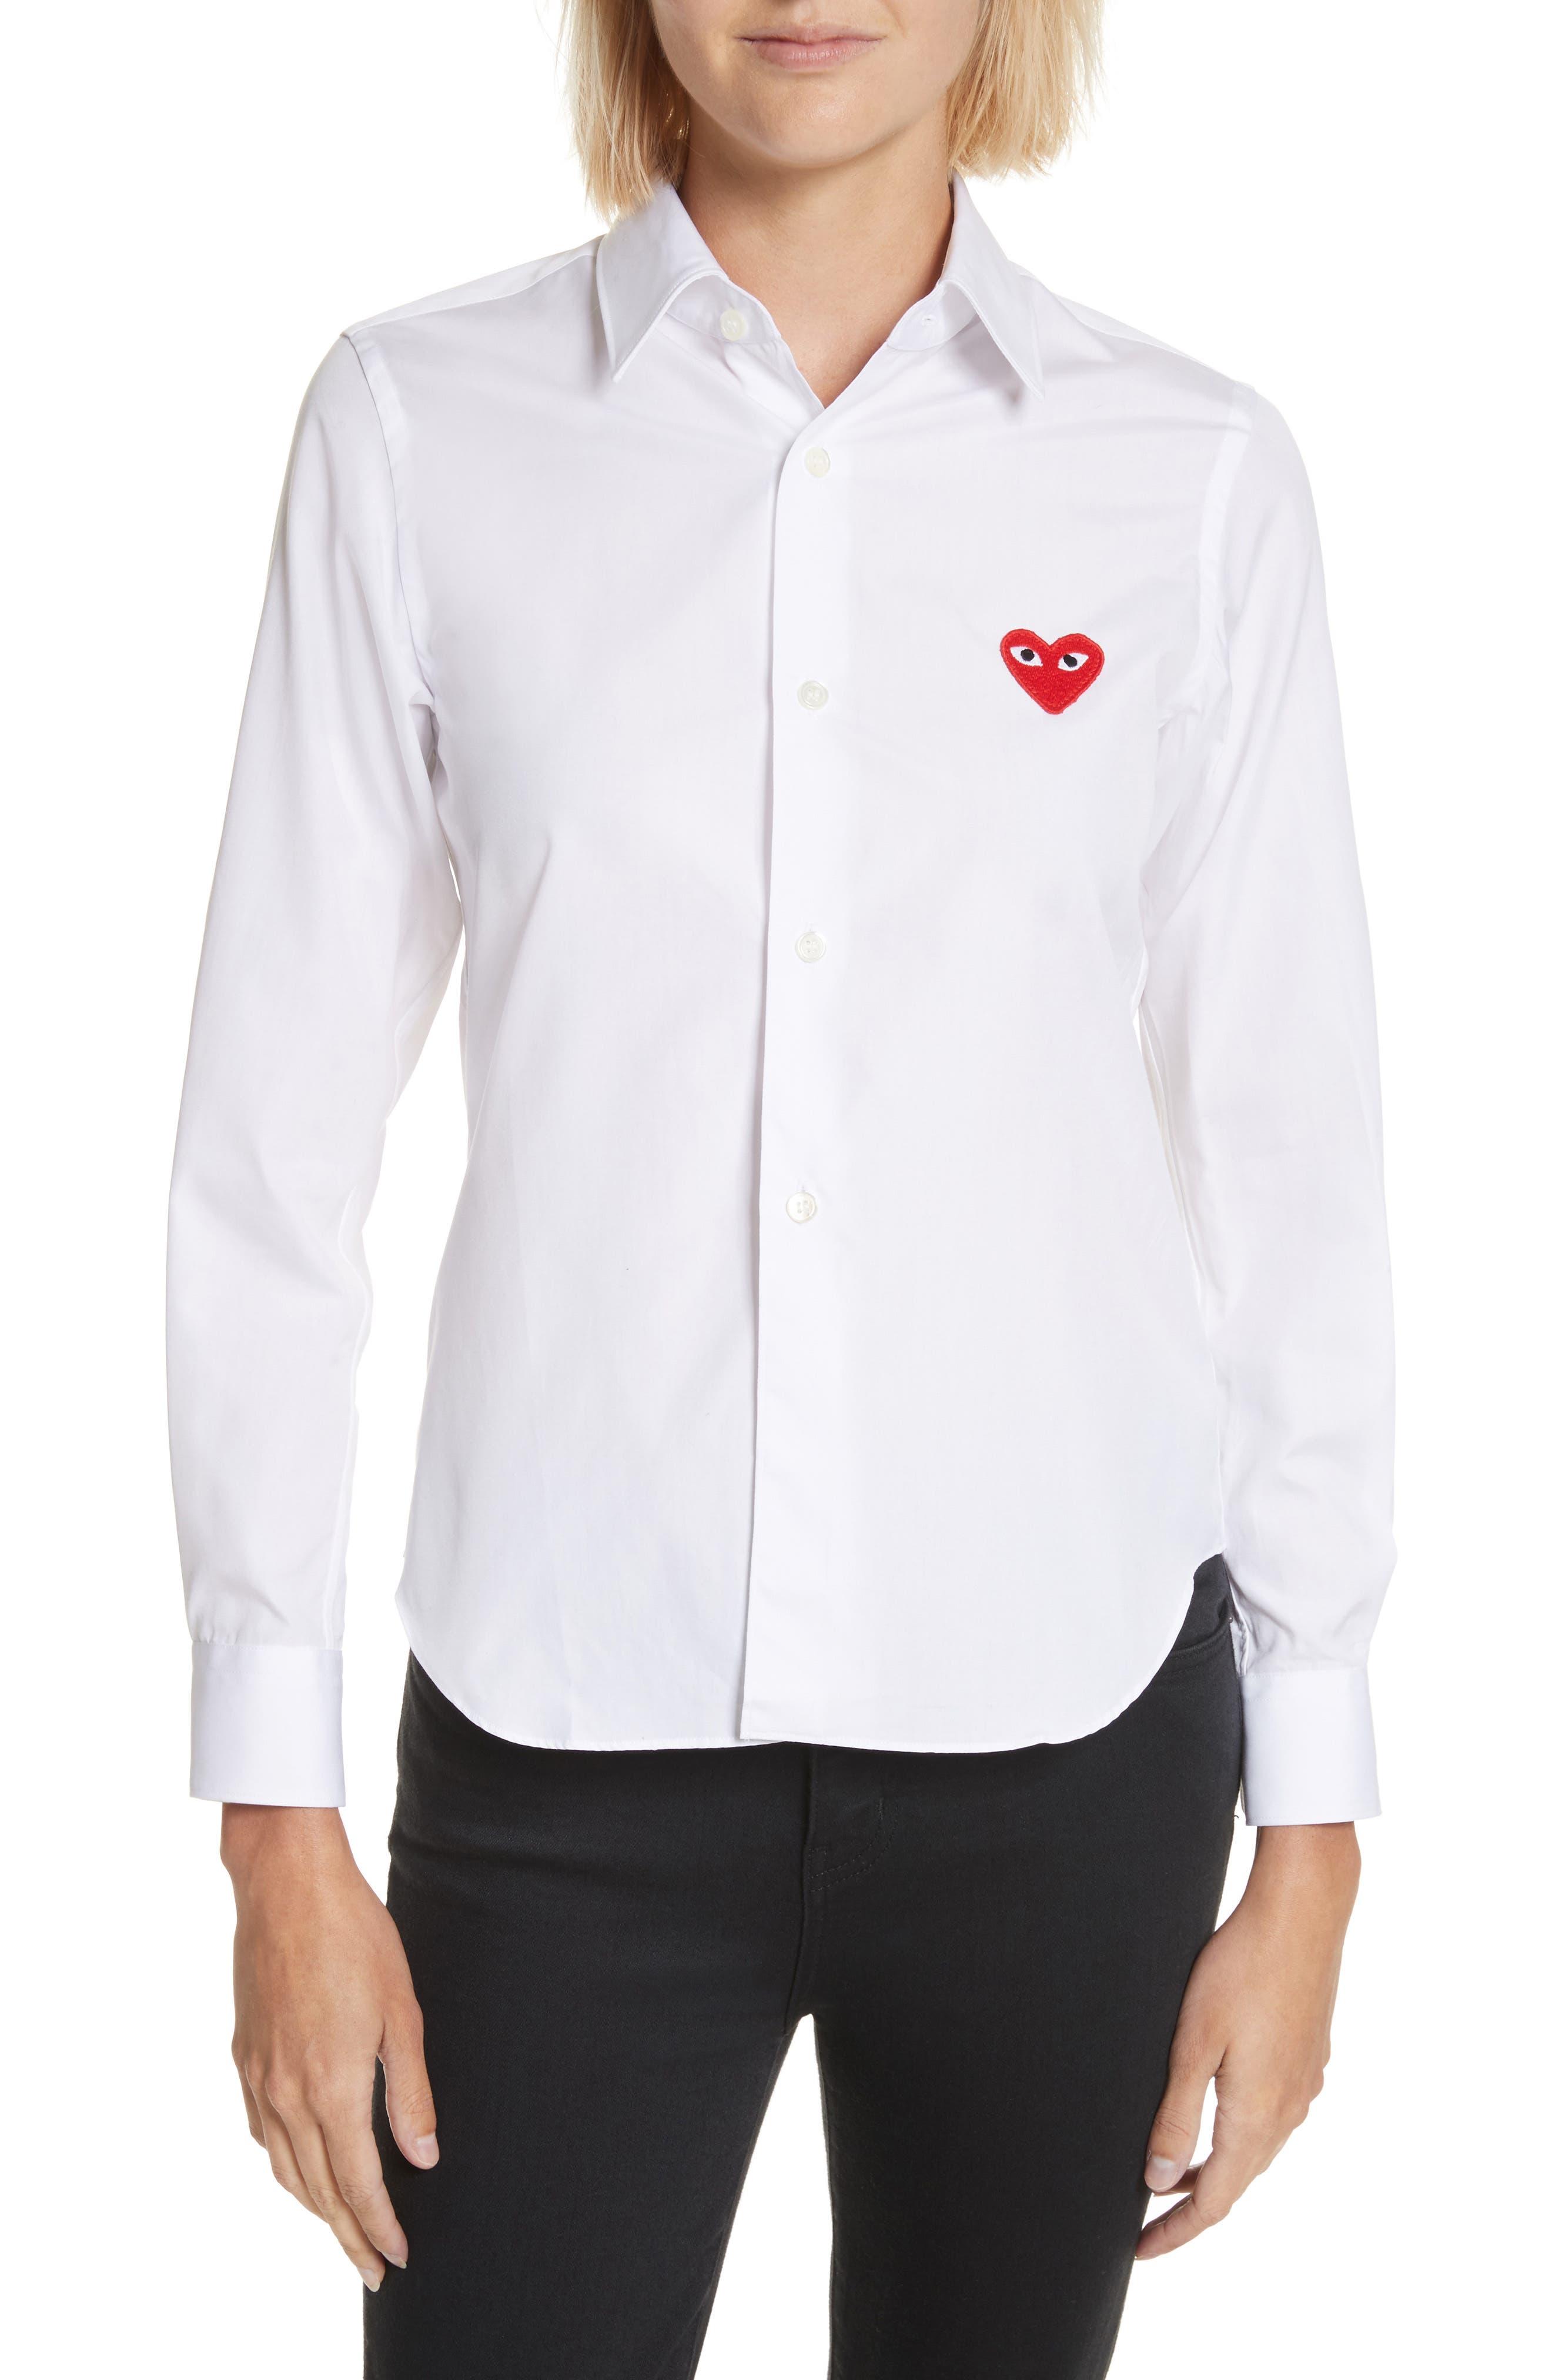 PLAY Red Heart Cotton Shirt,                             Main thumbnail 1, color,                             100